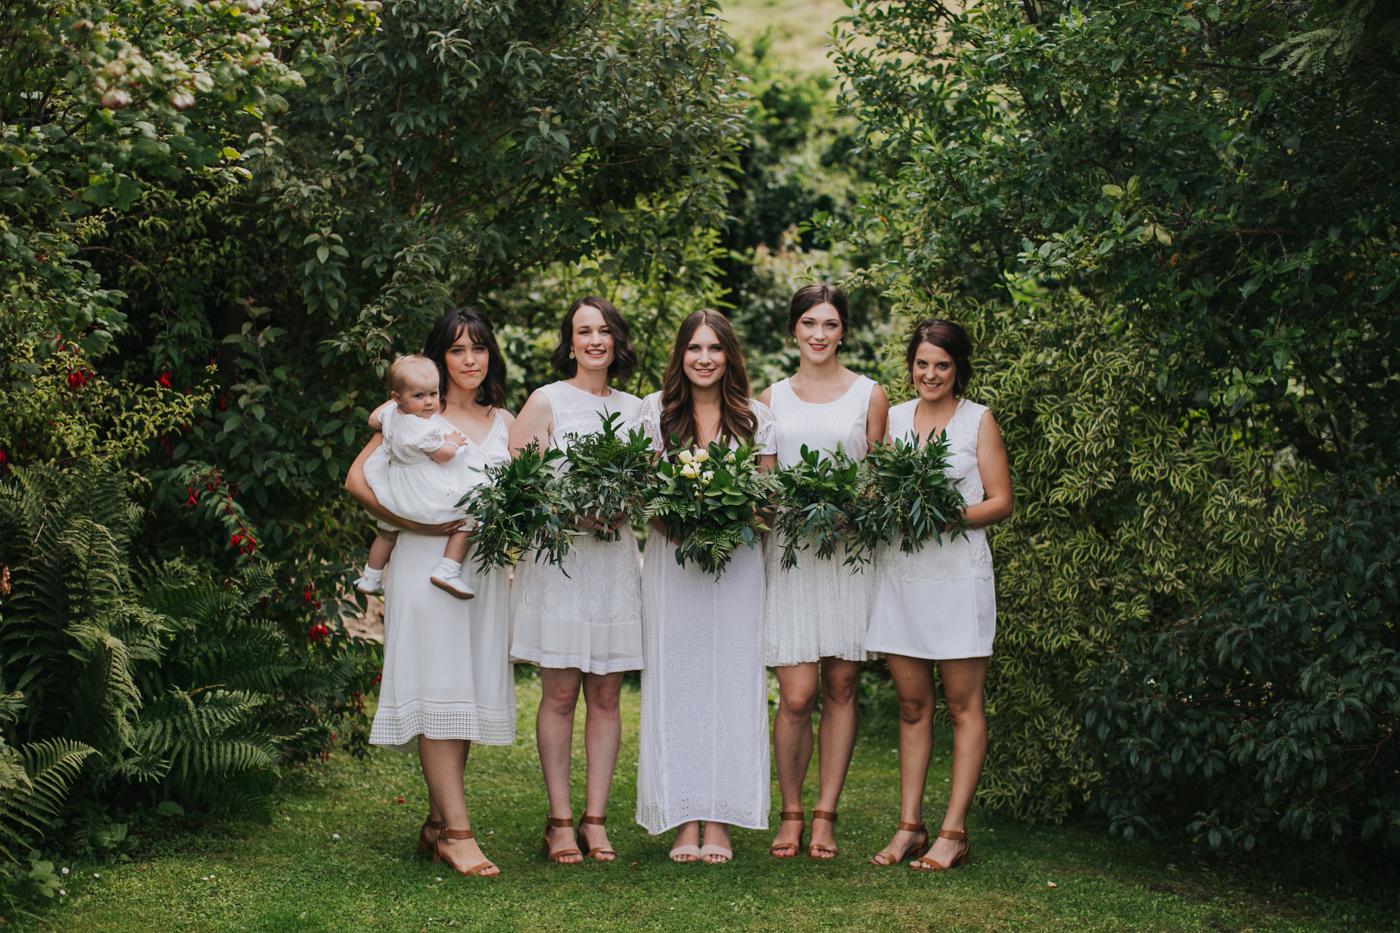 Ariana & Tim - Dunedin, New Zealand Wedding - Destination Wedding - Samantha Heather Photography-55.jpg